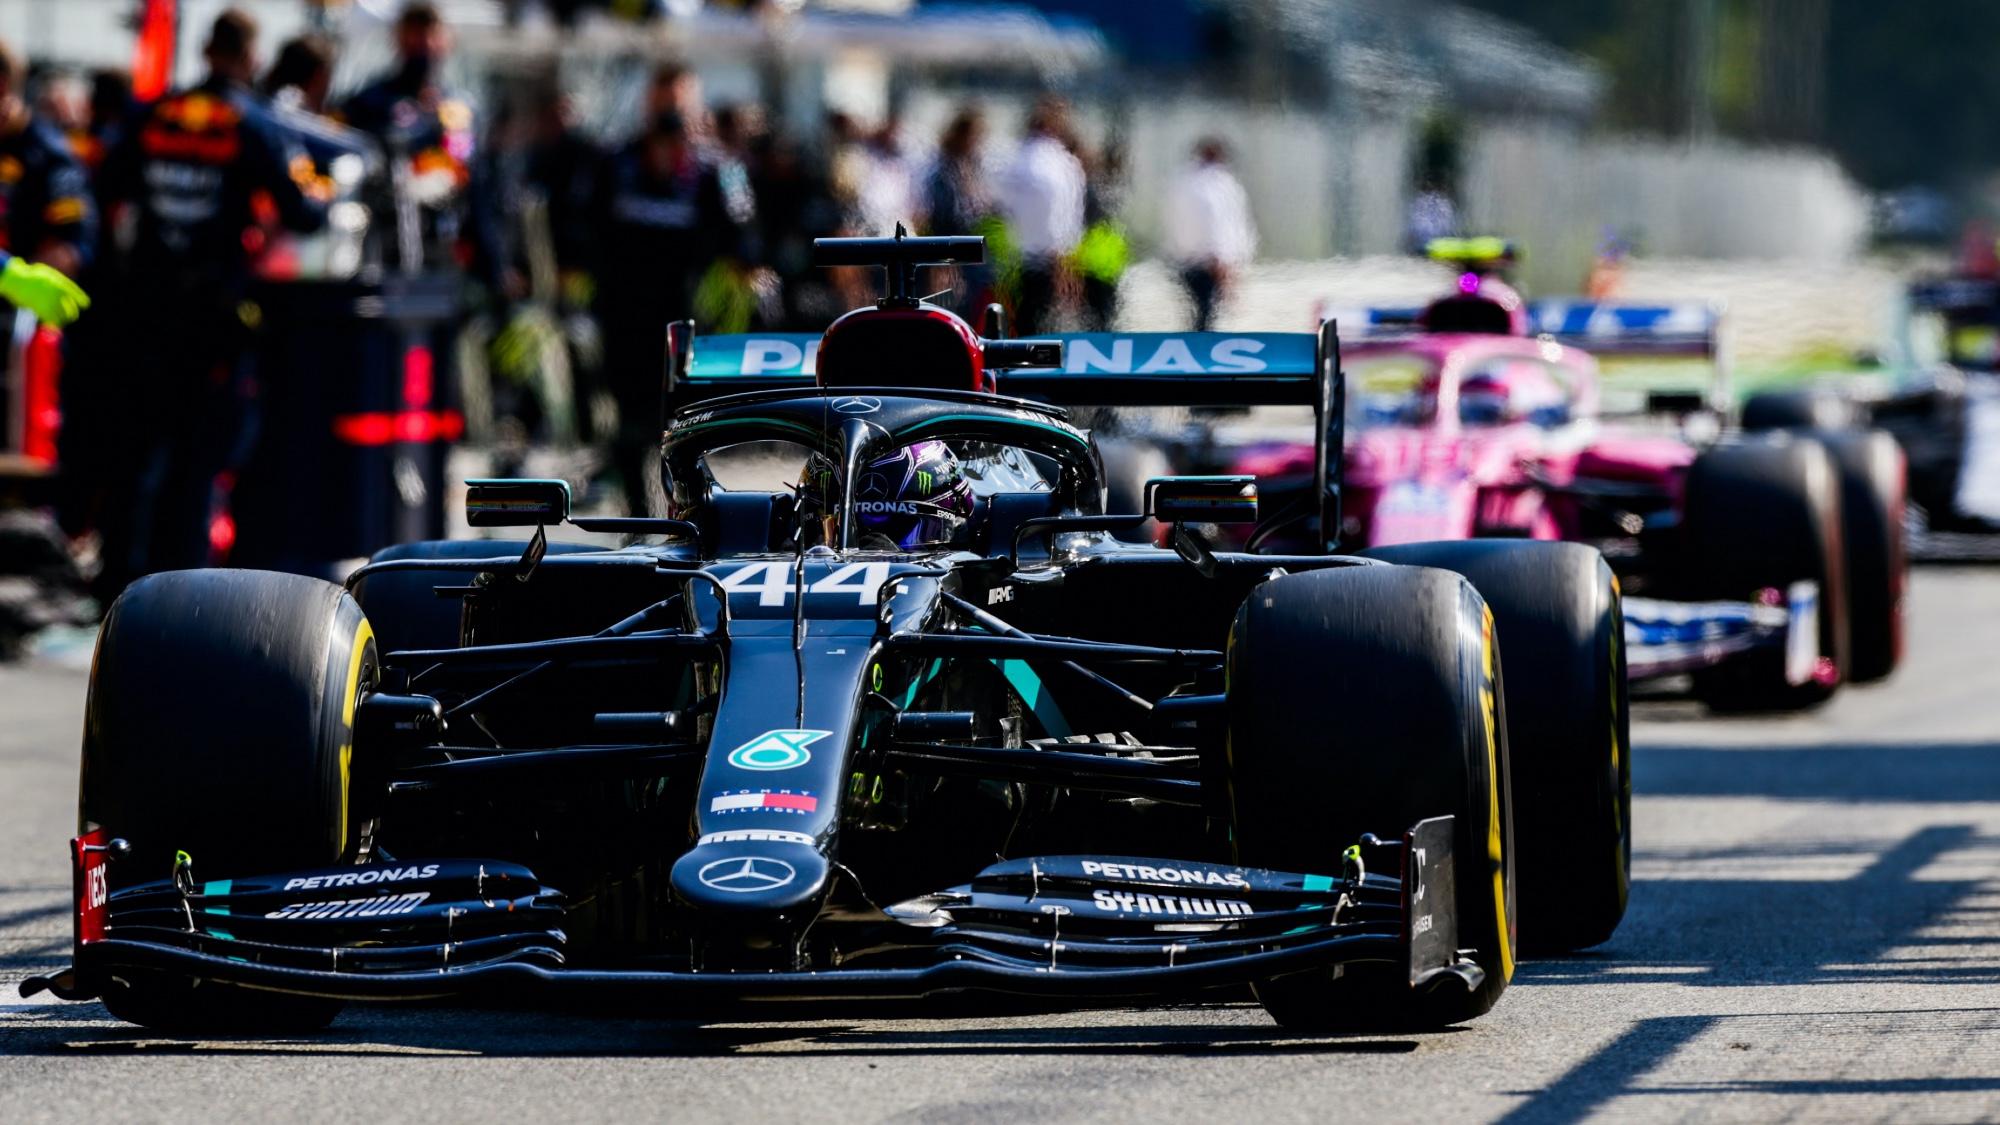 Lewis Hamilton, 2020 Italian GP